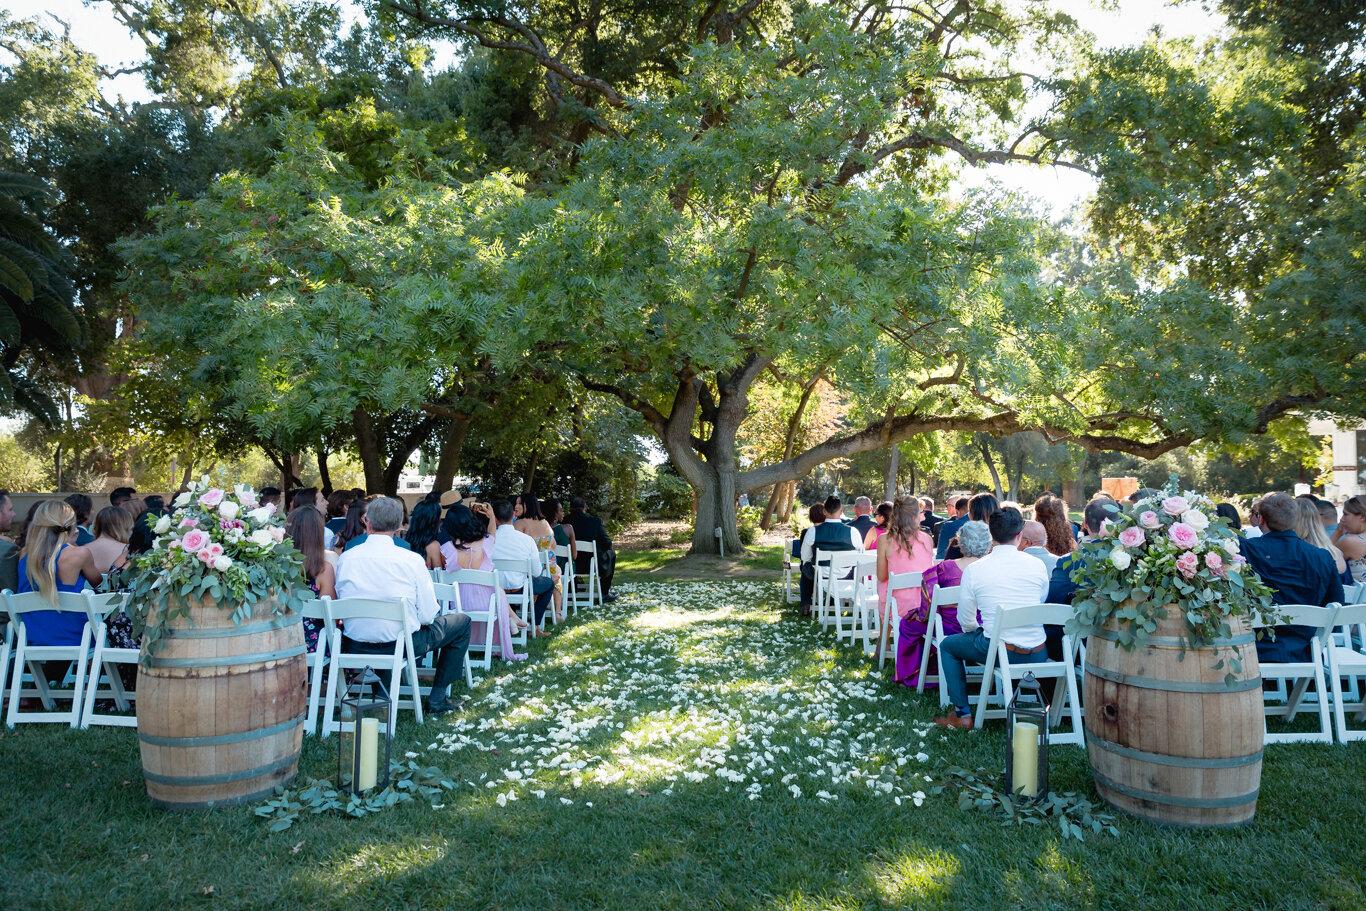 2019.08.24_Emily-Ashir-Wedding-at-the-Maples-5693.jpg